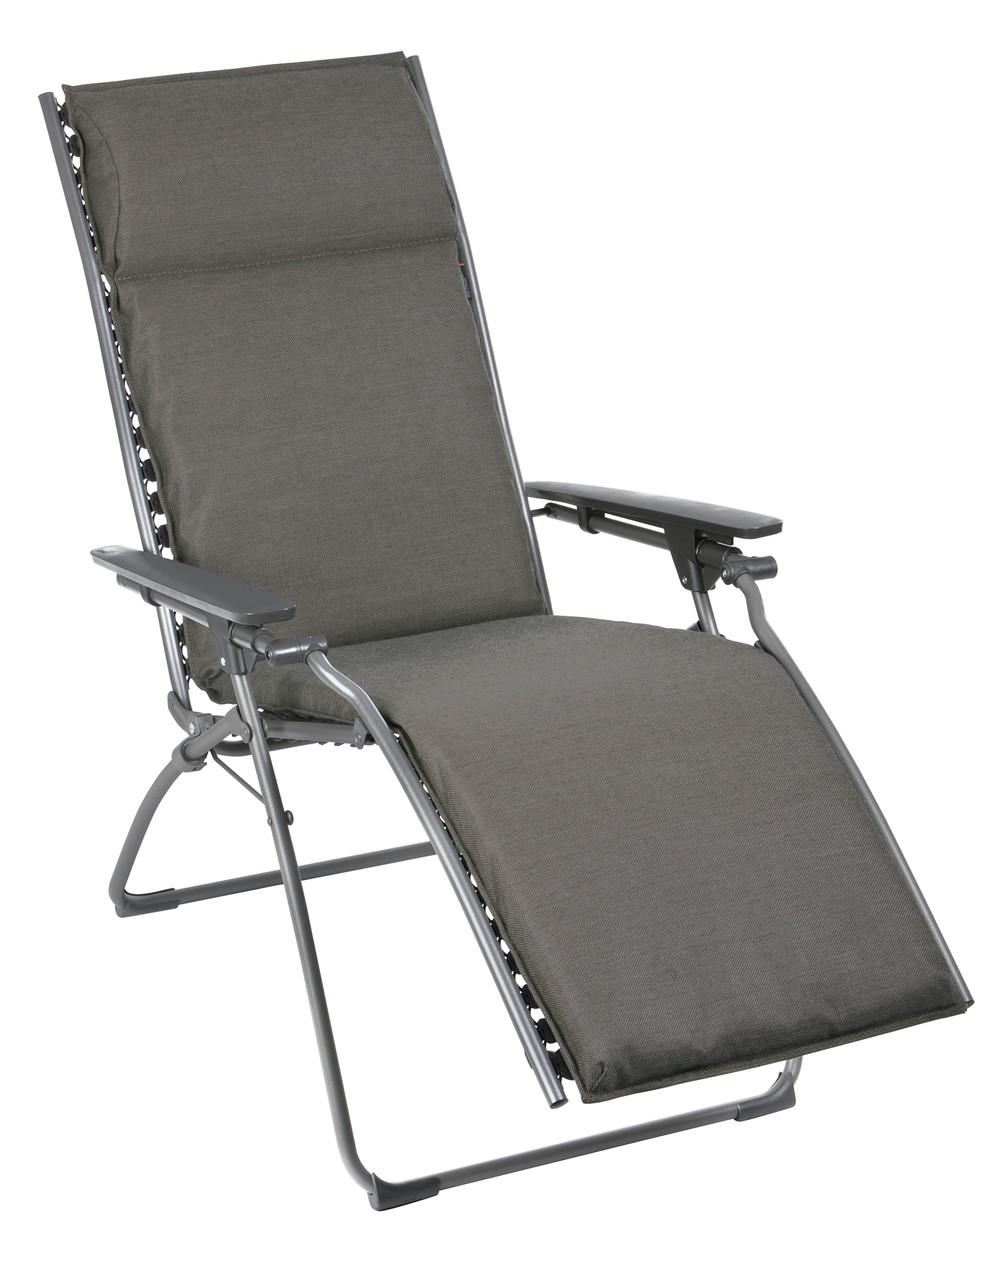 lafuma evolution hedona privilege zero gravity chair recliner - Zero Gravity Chair